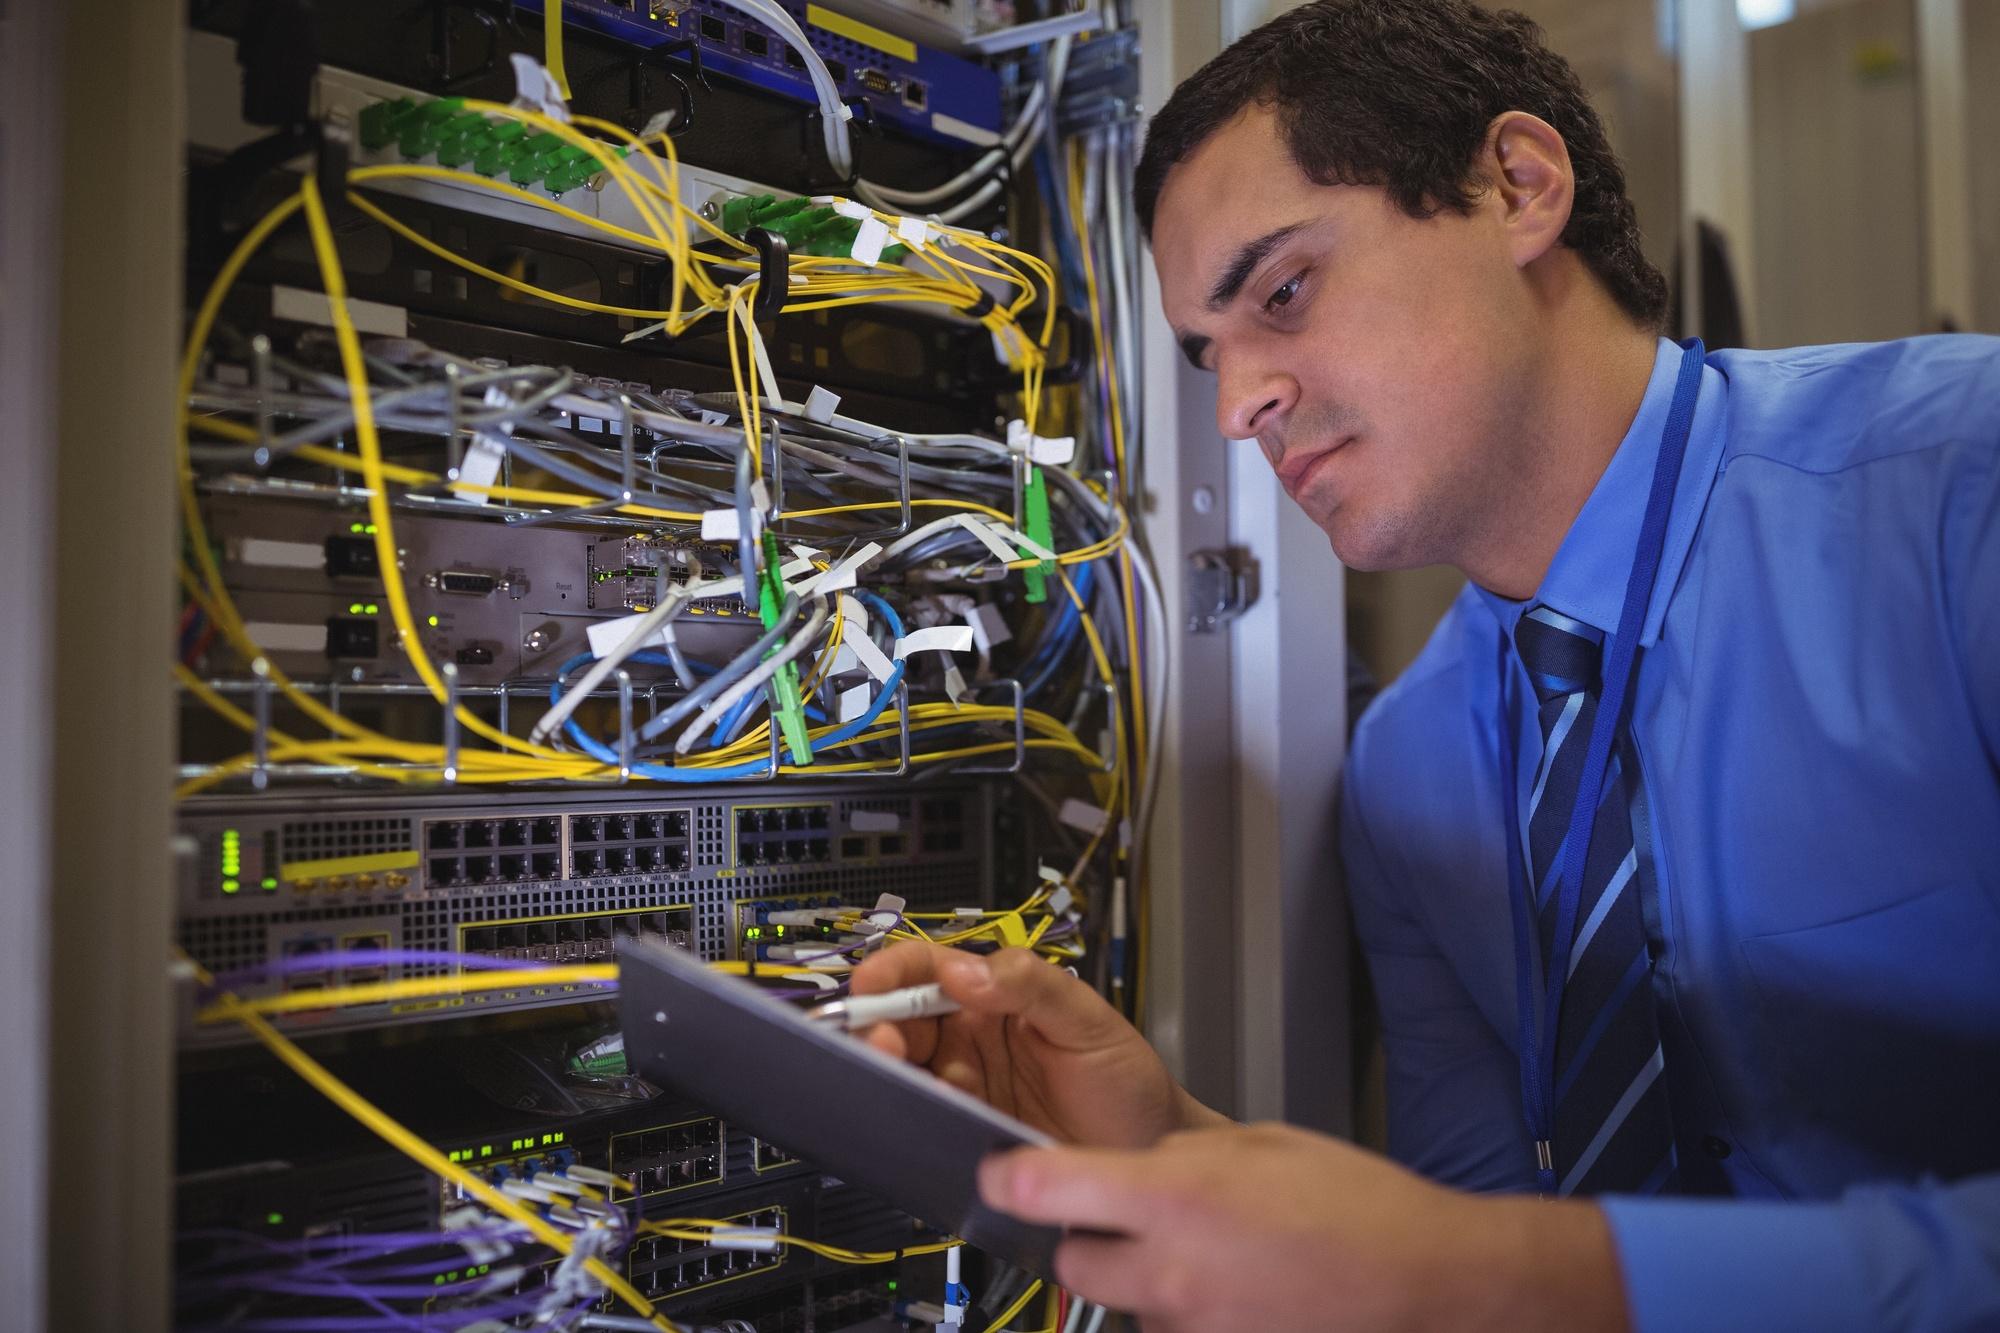 Technician maintaining record of rack